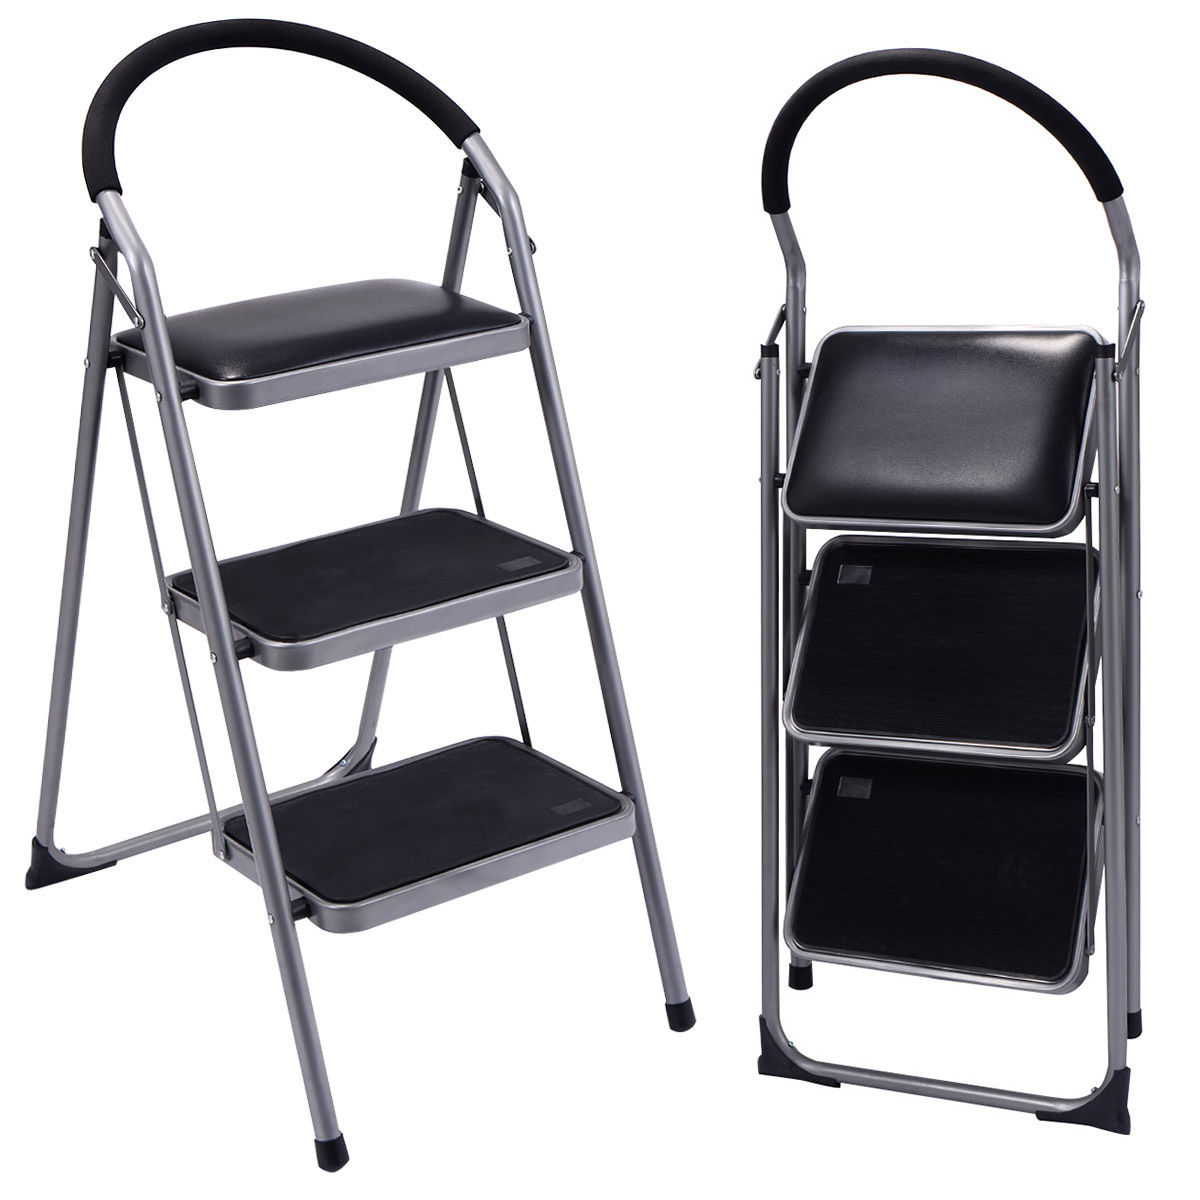 Costway Non Slip 3 Step Ladder Lightweight Folding Stool